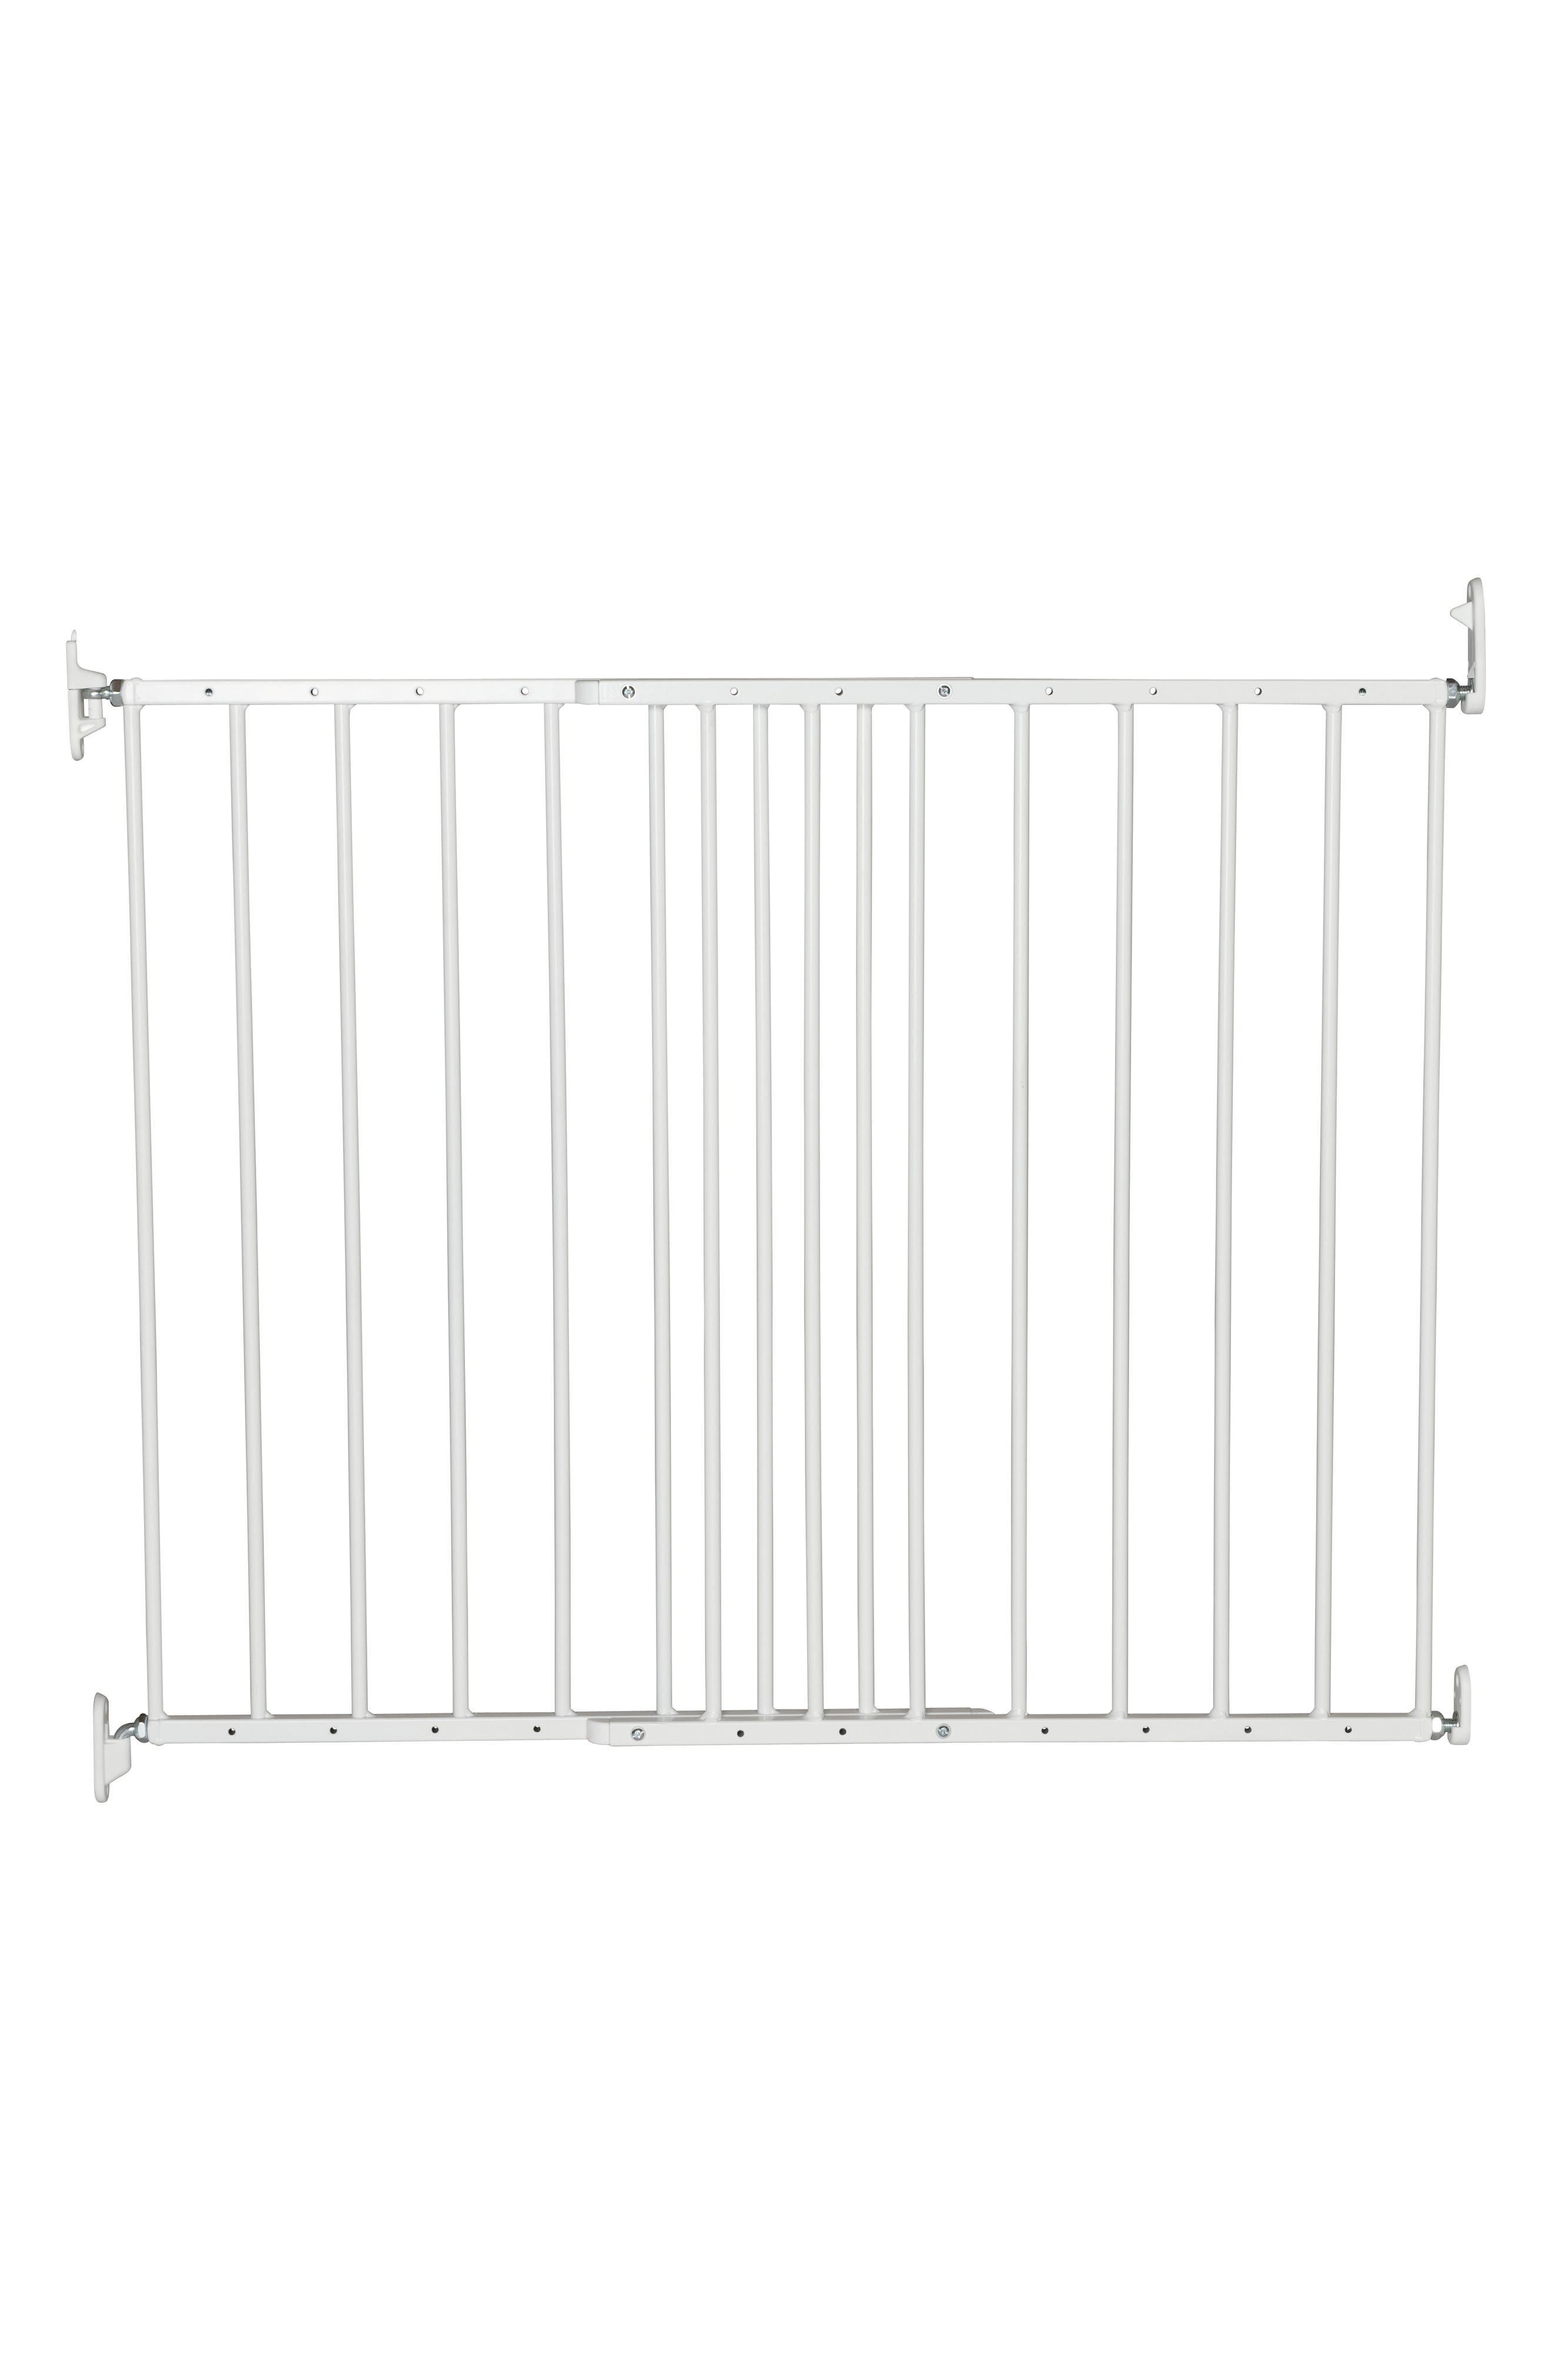 MultiDan Extending Hard Mount Metal Safety Gate,                             Main thumbnail 1, color,                             WHITE